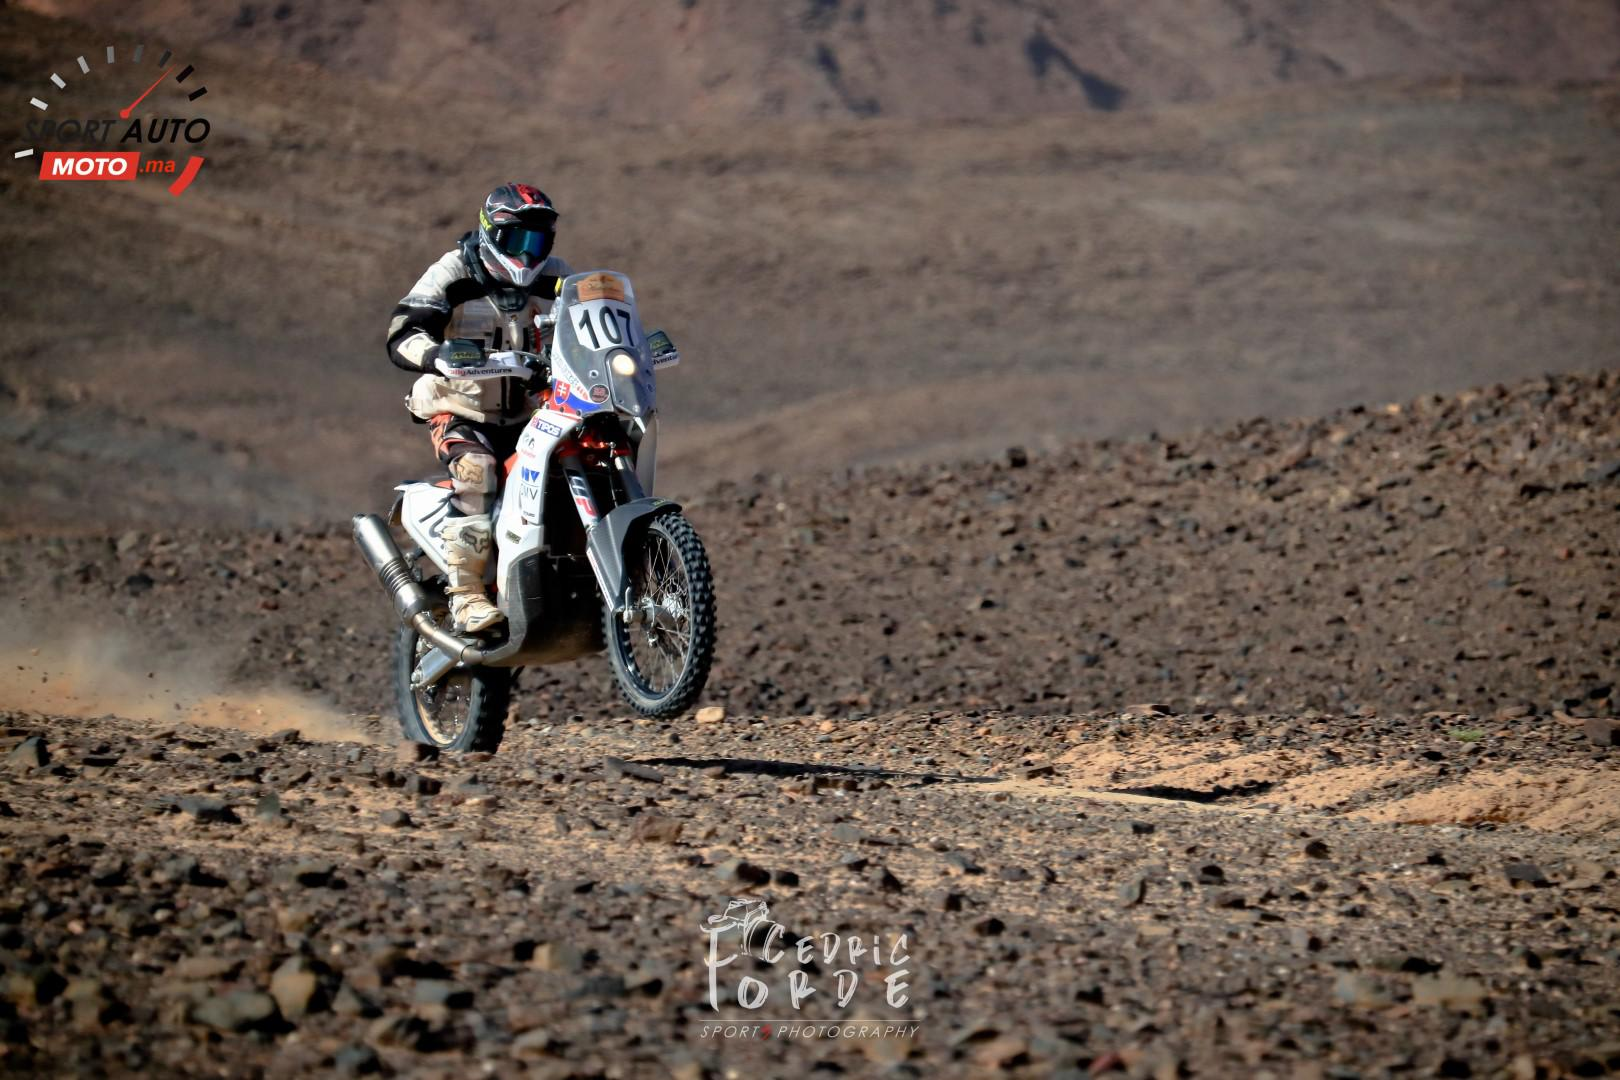 hearts-of-morocco-2018-zapletal-et-pedrero-remporte-le-rallye-899-1.jpg